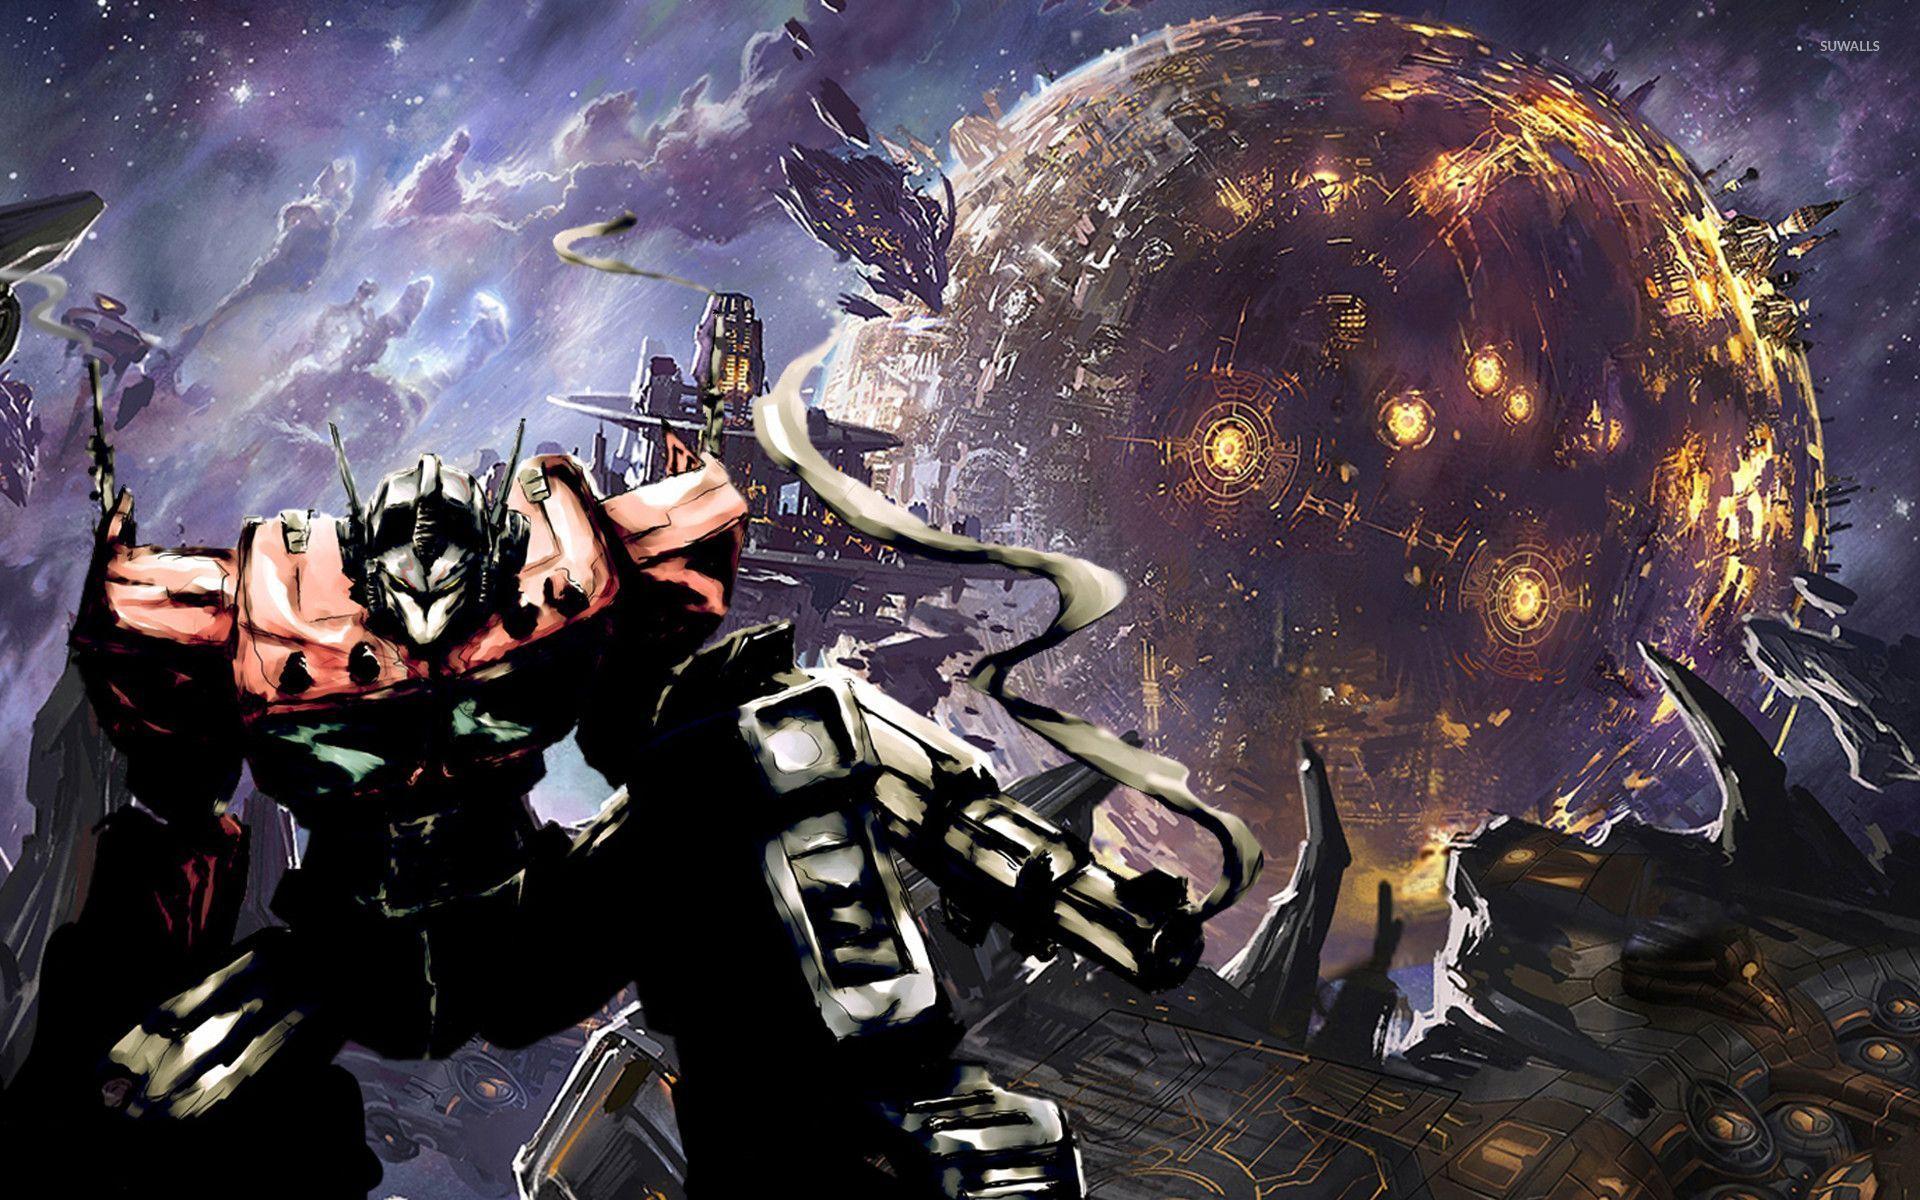 Fall Of Cybertron Wallpaper Hd Transformers War For Cybertron Wallpaper Comic